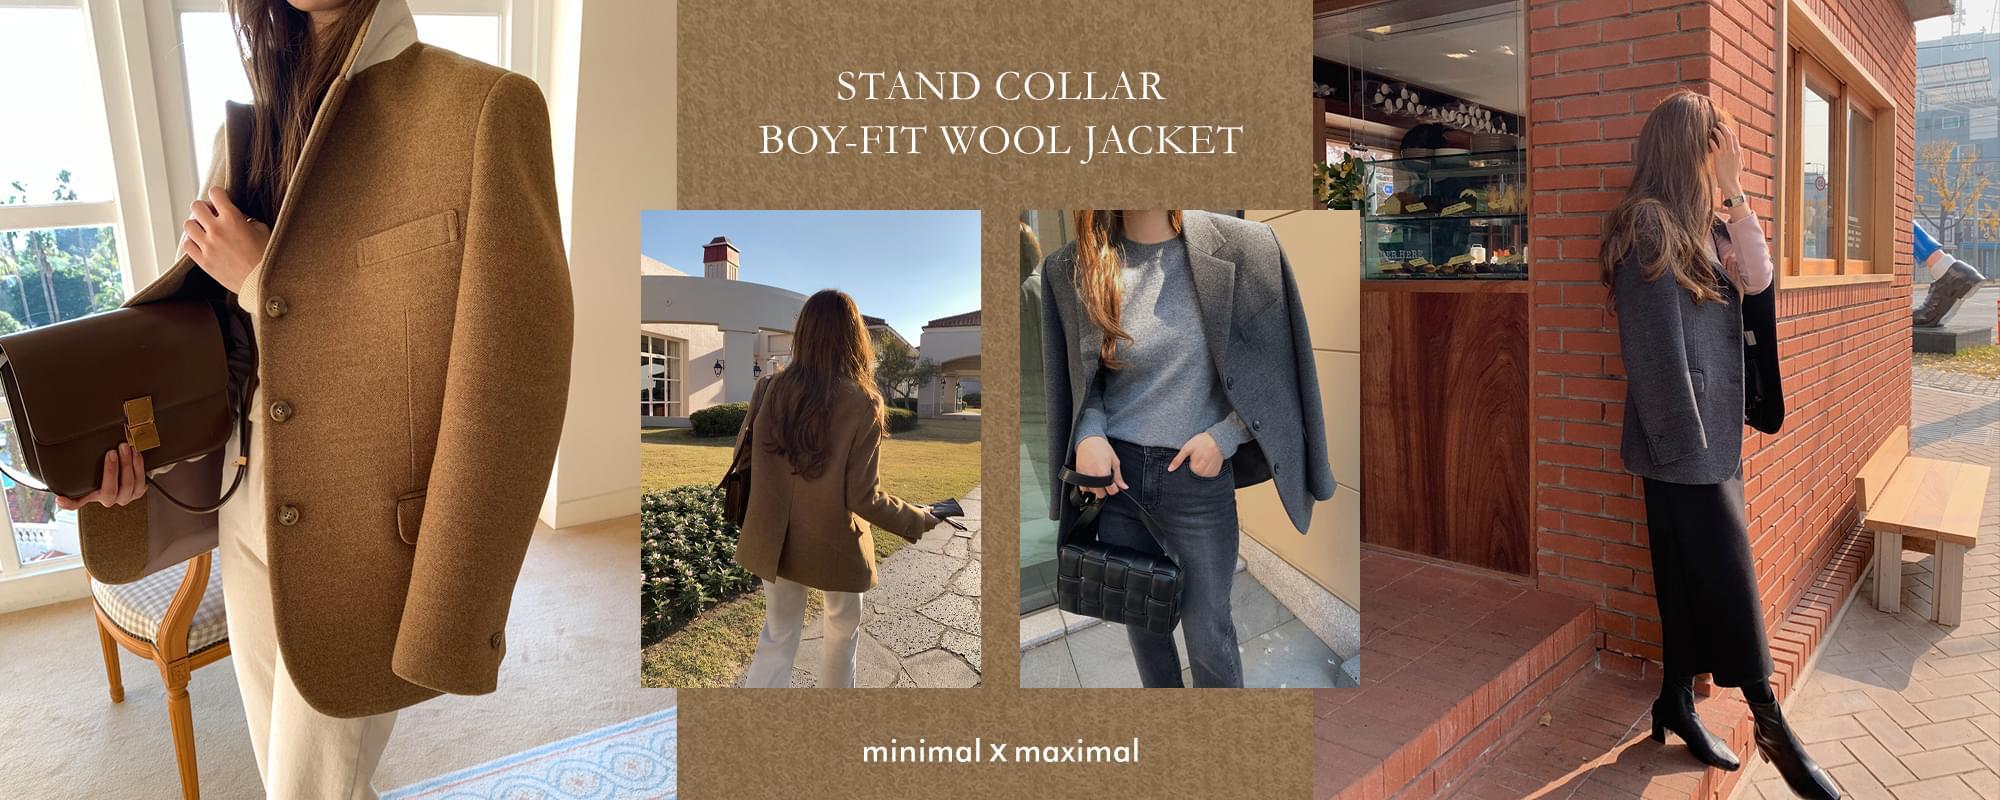 MMMM/ Stan Collar Boyfit Wool Jacket